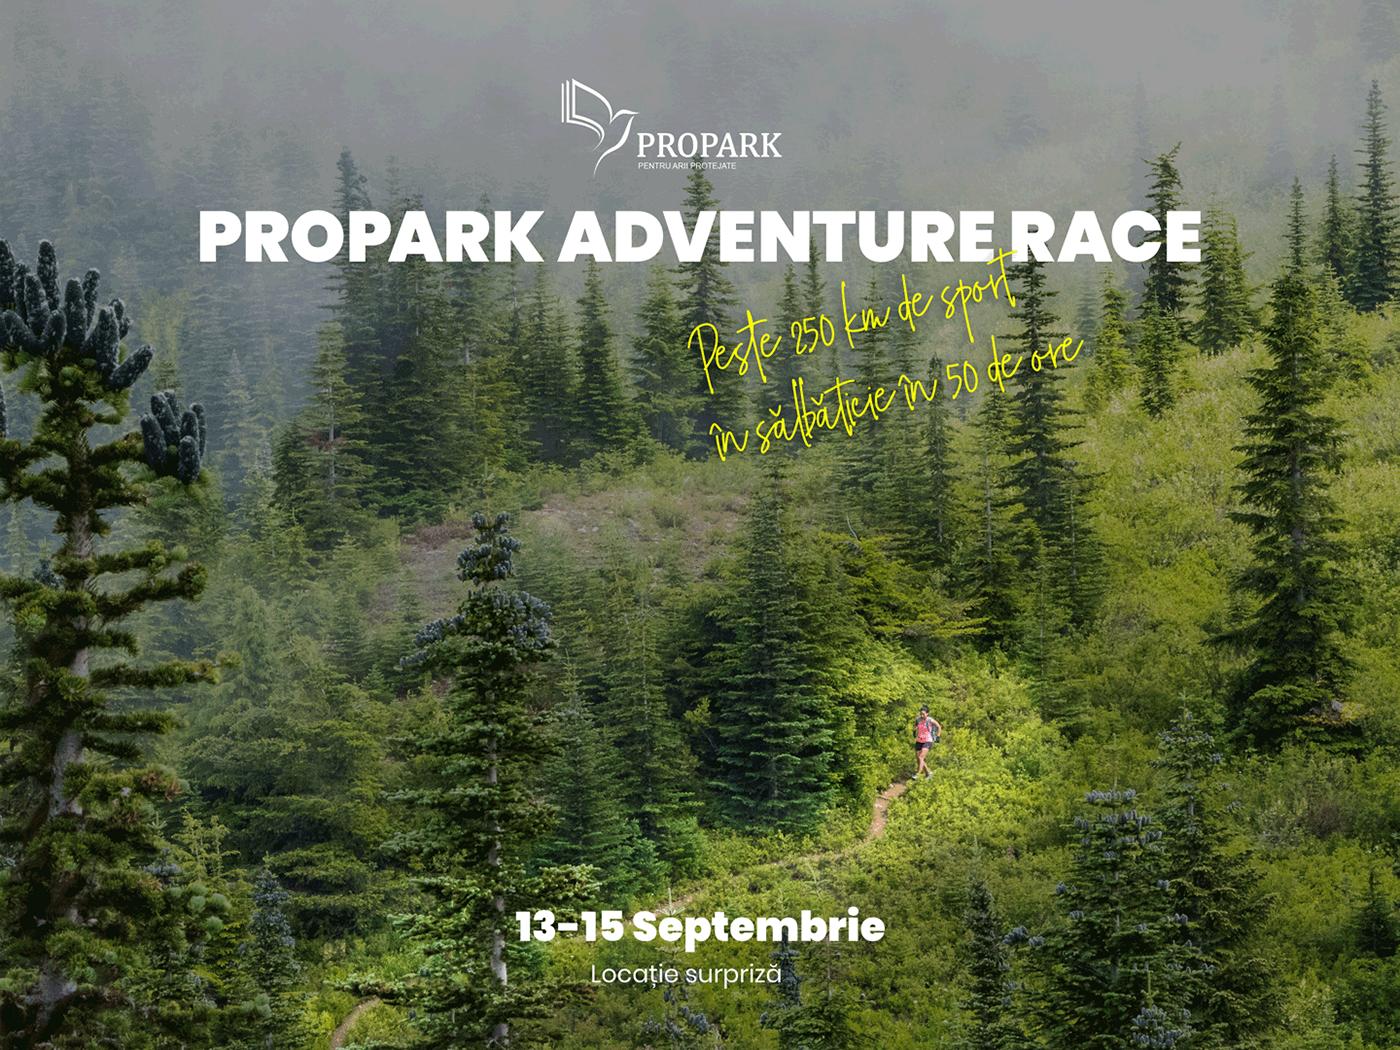 Marathon adventure poster propark